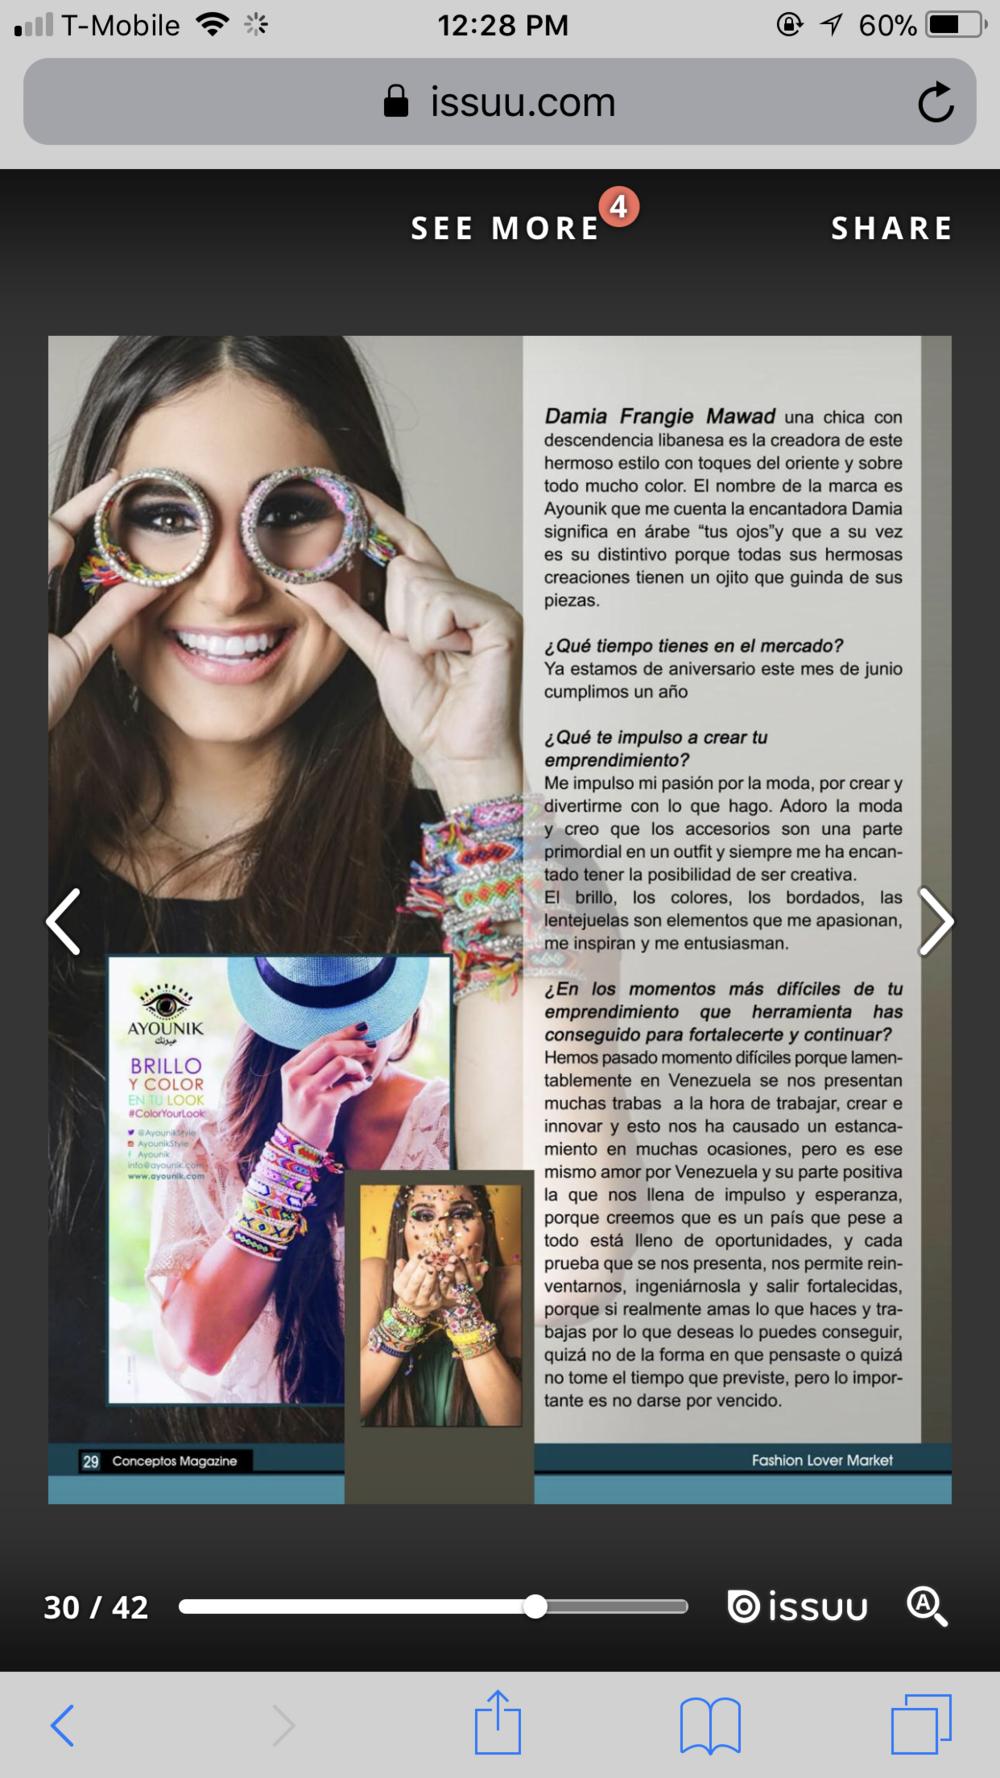 """Conceptos Magazine"", 2016, Miami, USA"